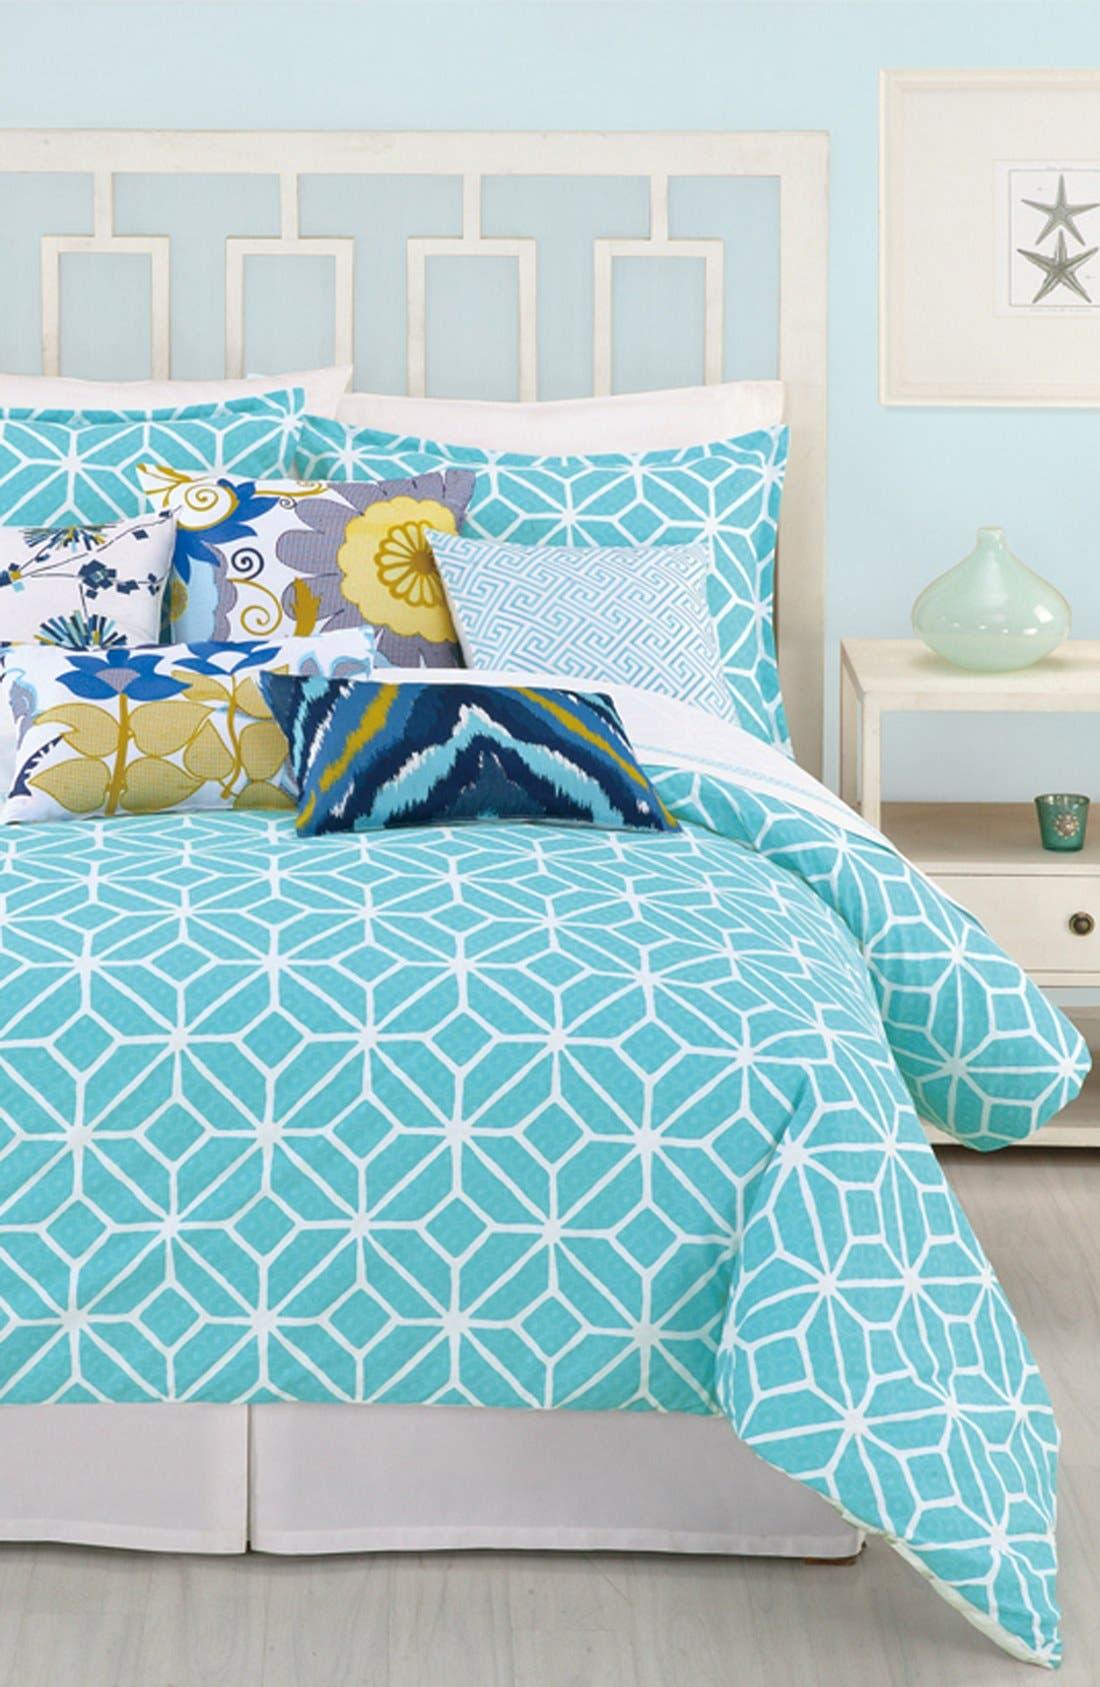 Alternate Image 1 Selected - Trina Turk 'Trellis' Twin Comforter & Shams